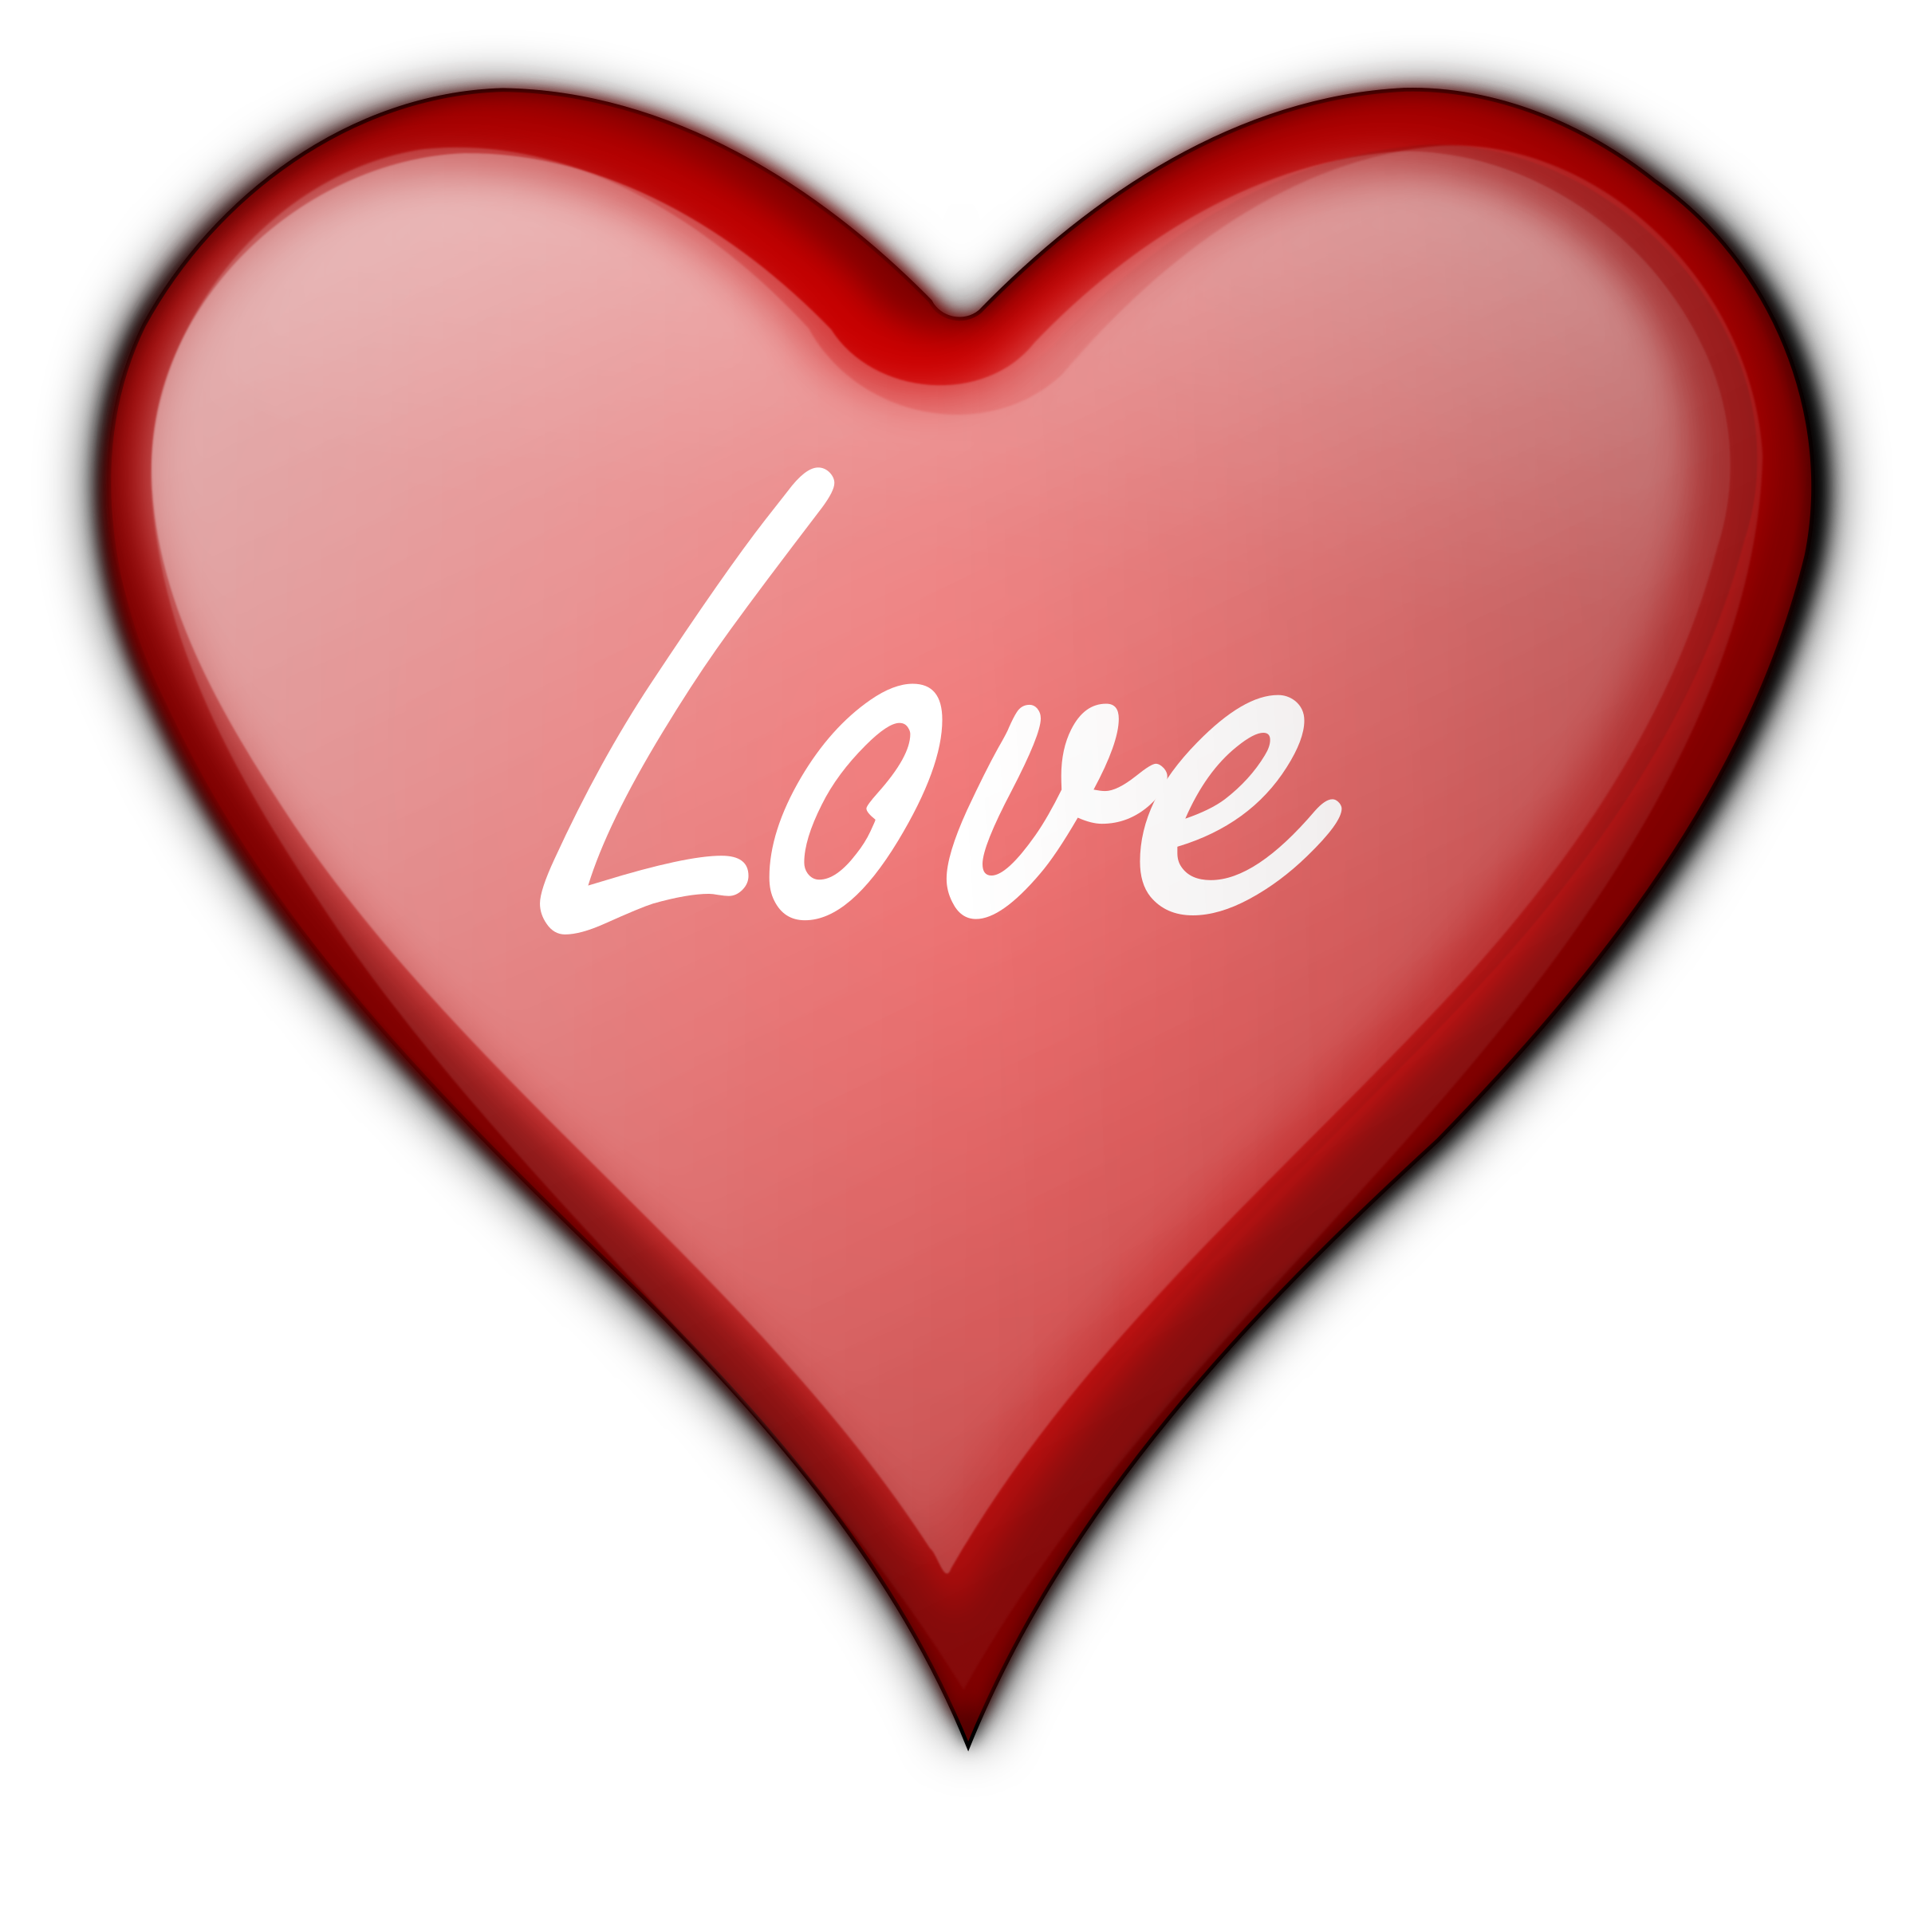 Heart clipart human. Gloss big image png